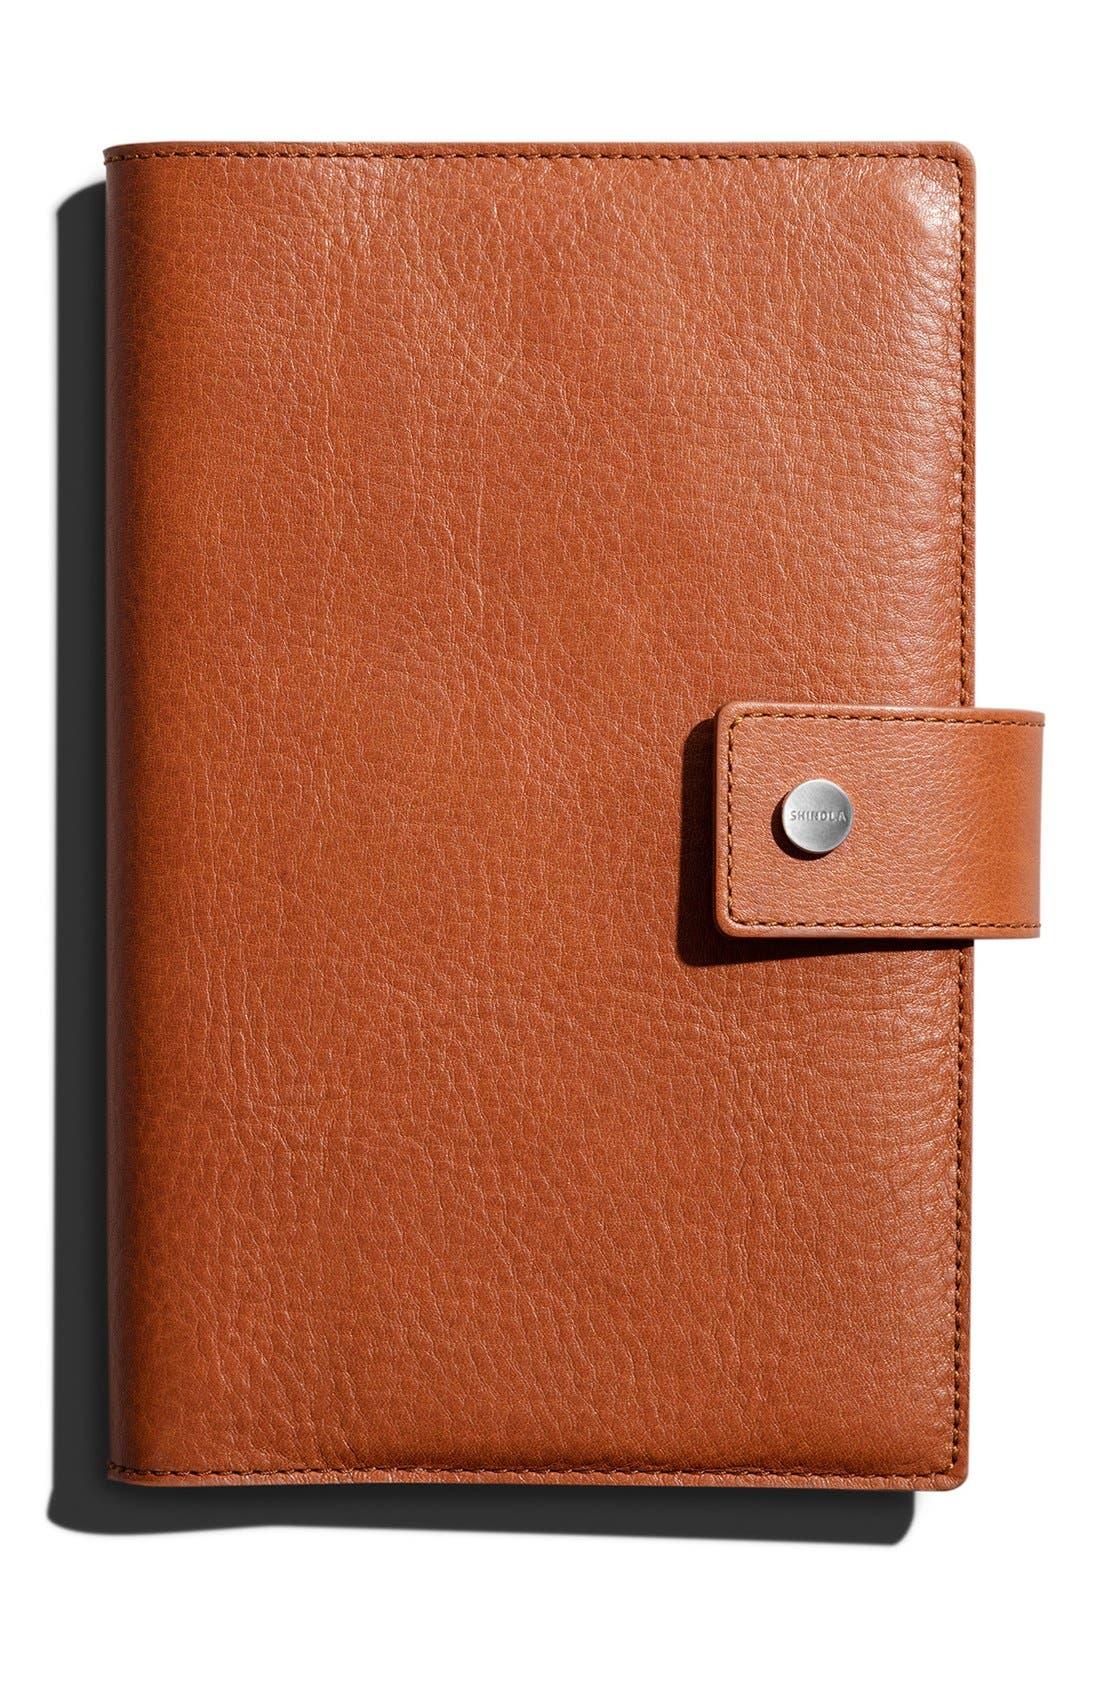 Alternate Image 1 Selected - Shinola iPad mini Case